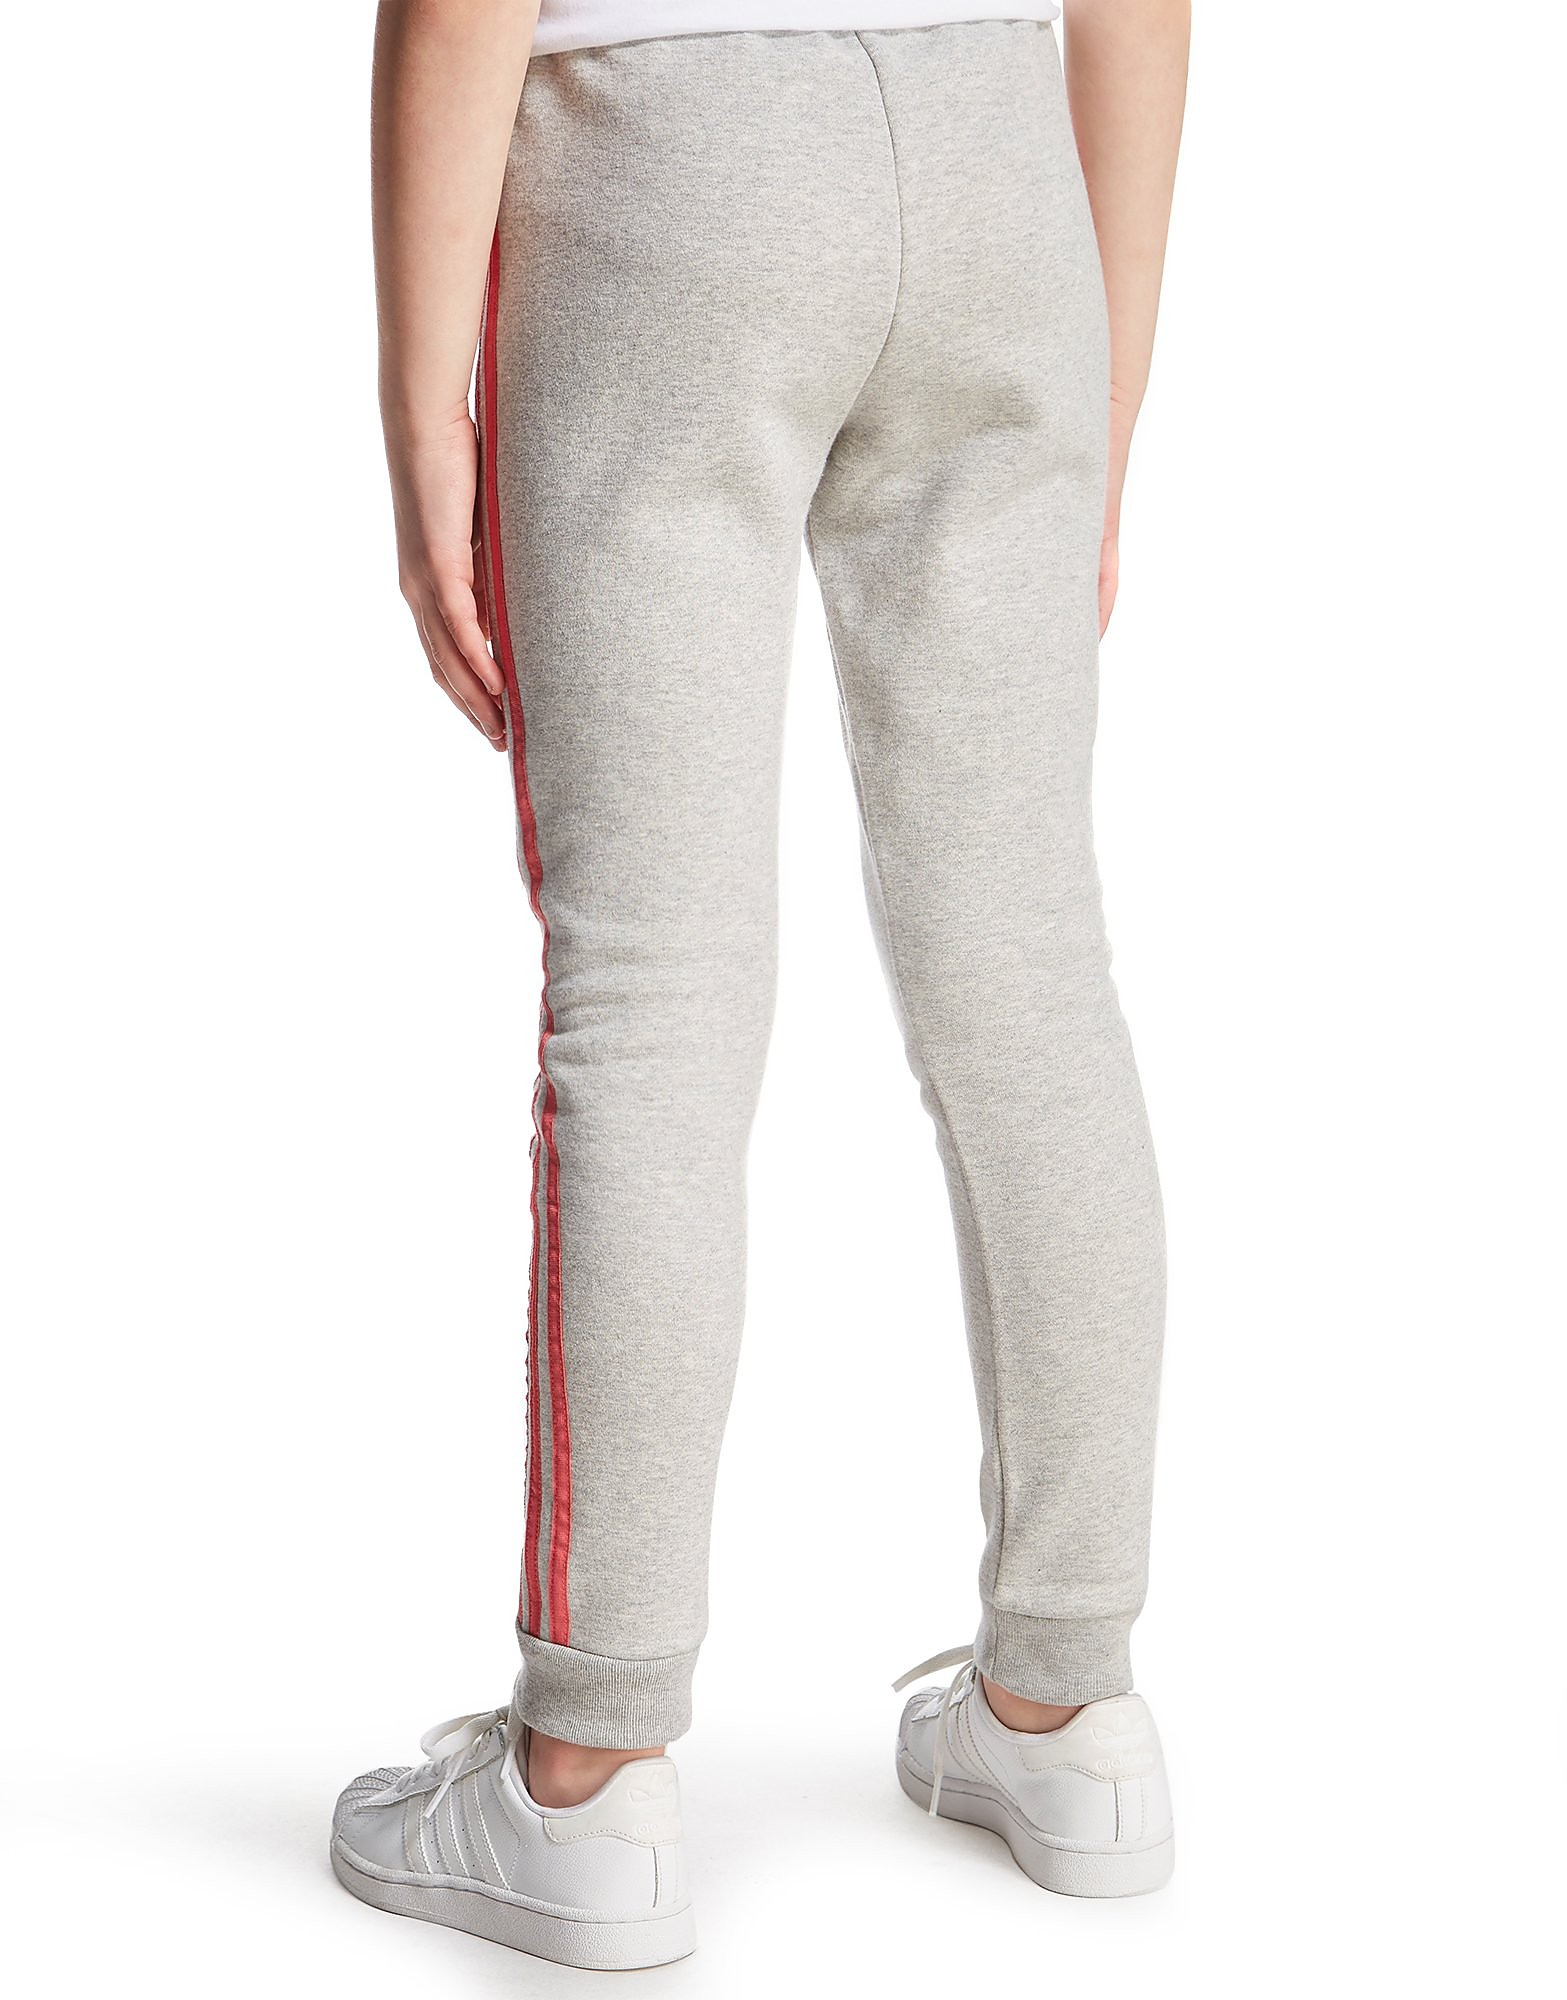 adidas Originals Girls Super Jogging Pants Junior